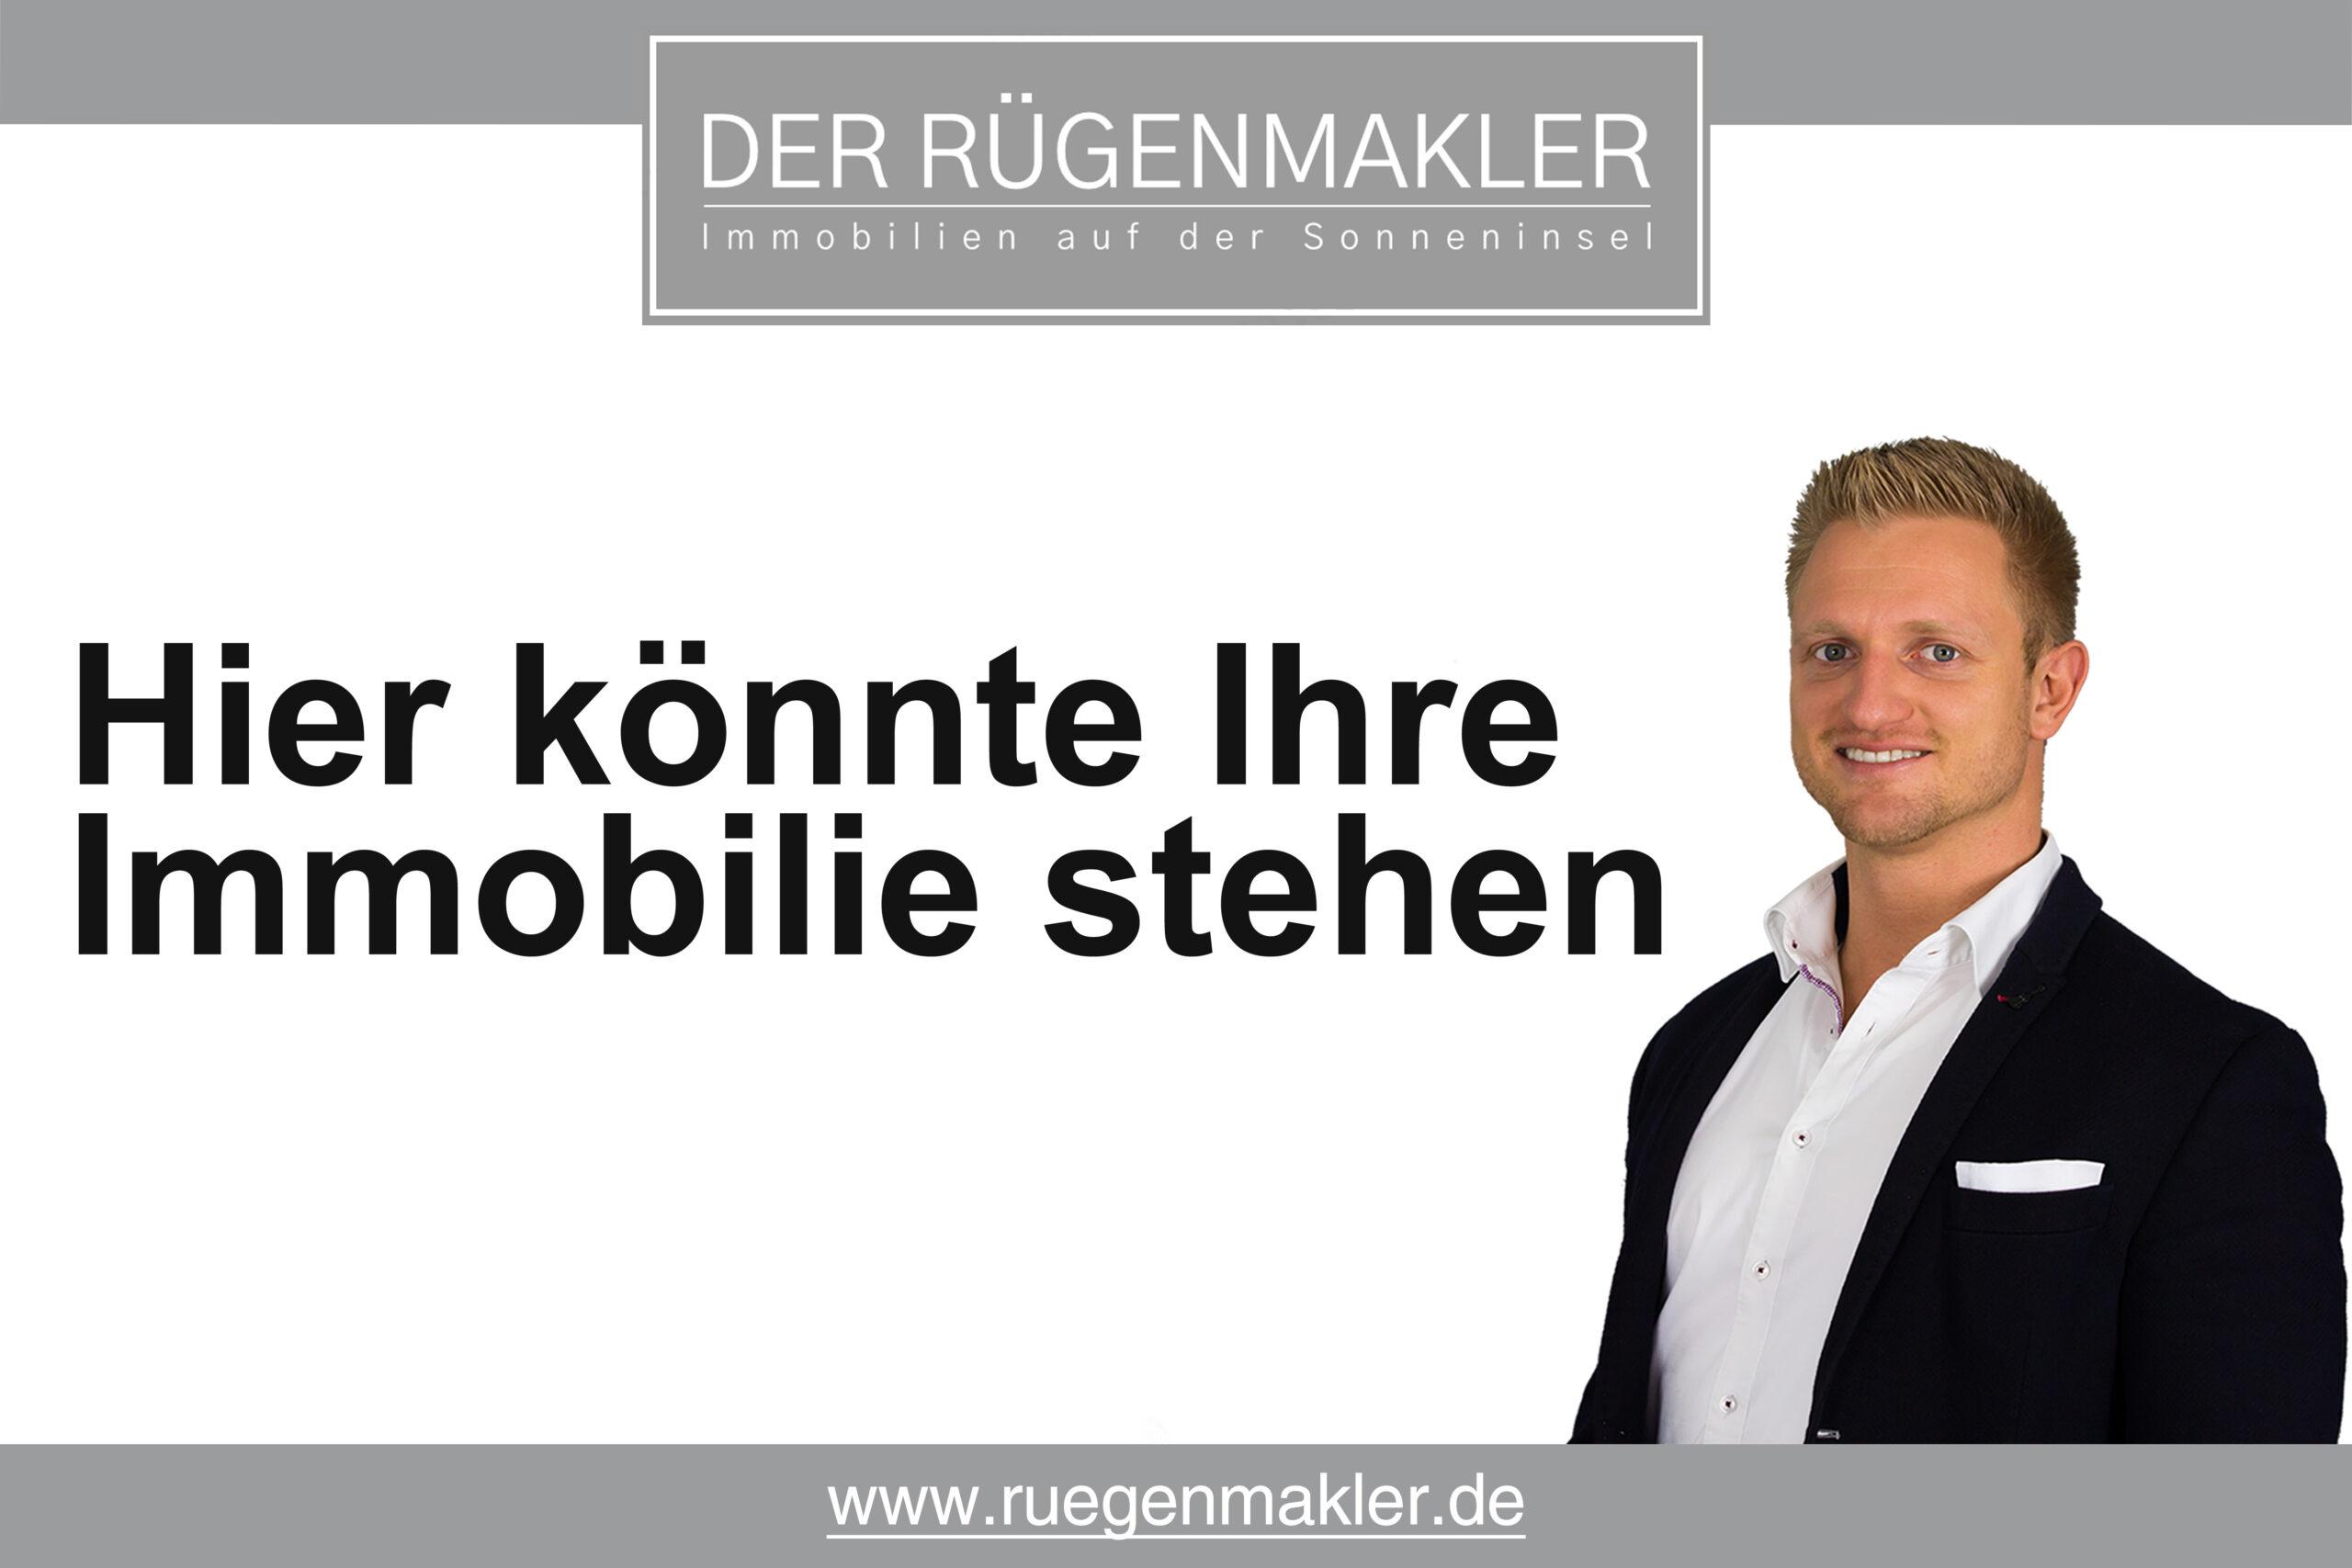 ruegenmakler-immobilienangebot